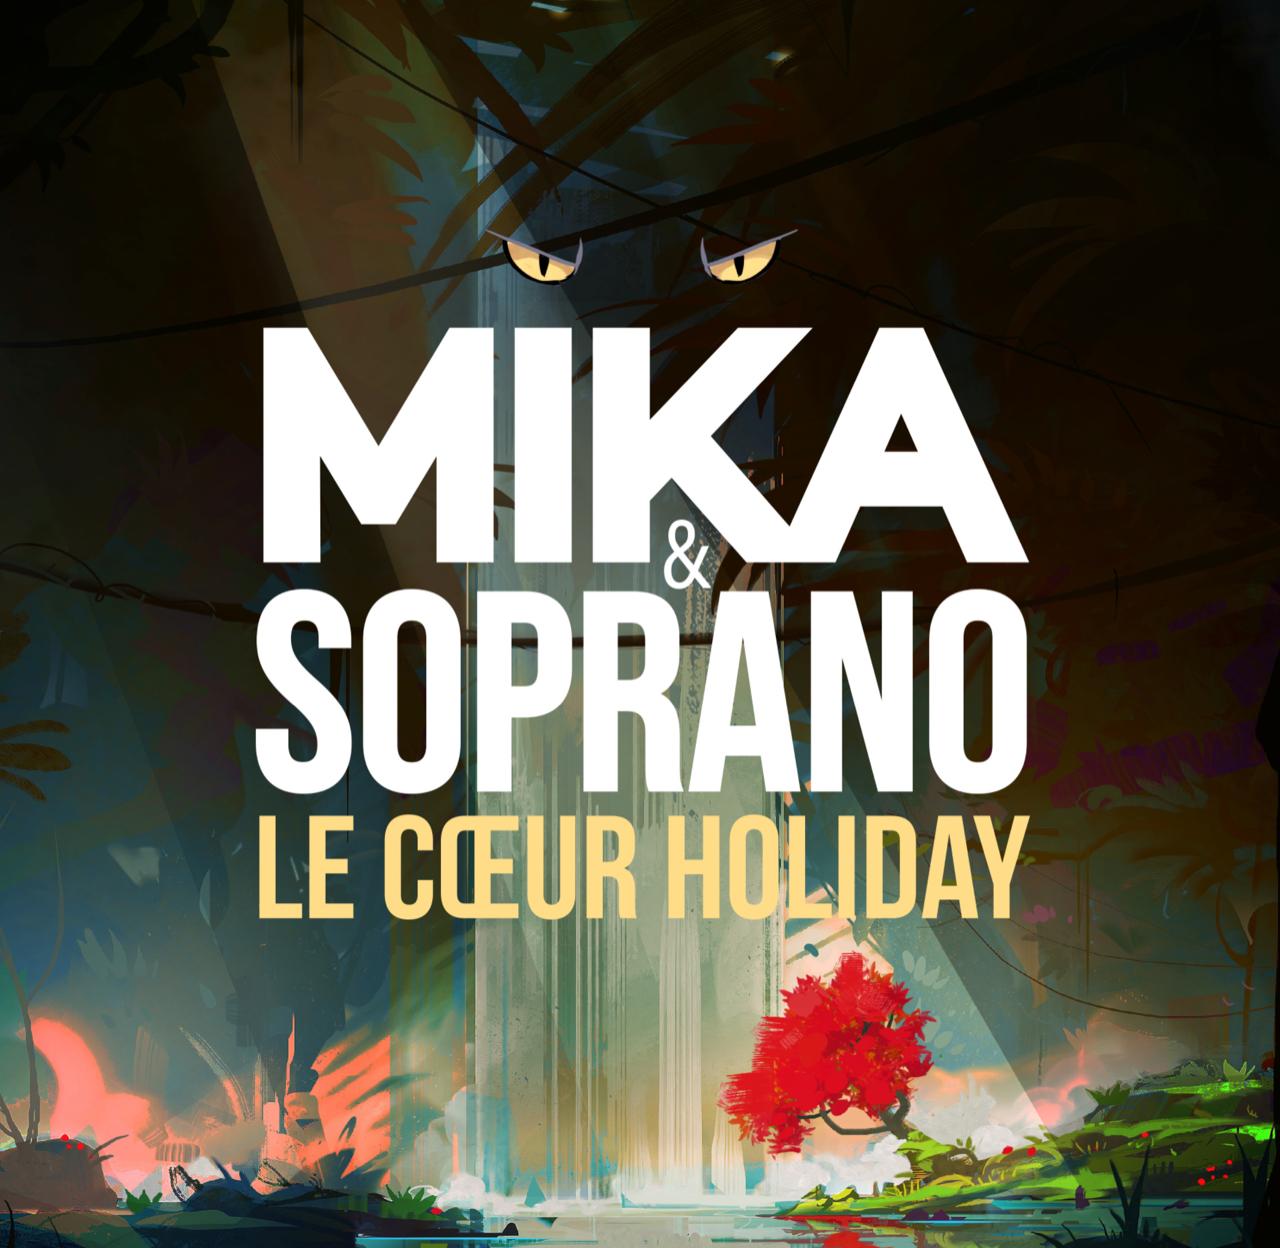 Mika & Soprano - Le Coeur Holiday